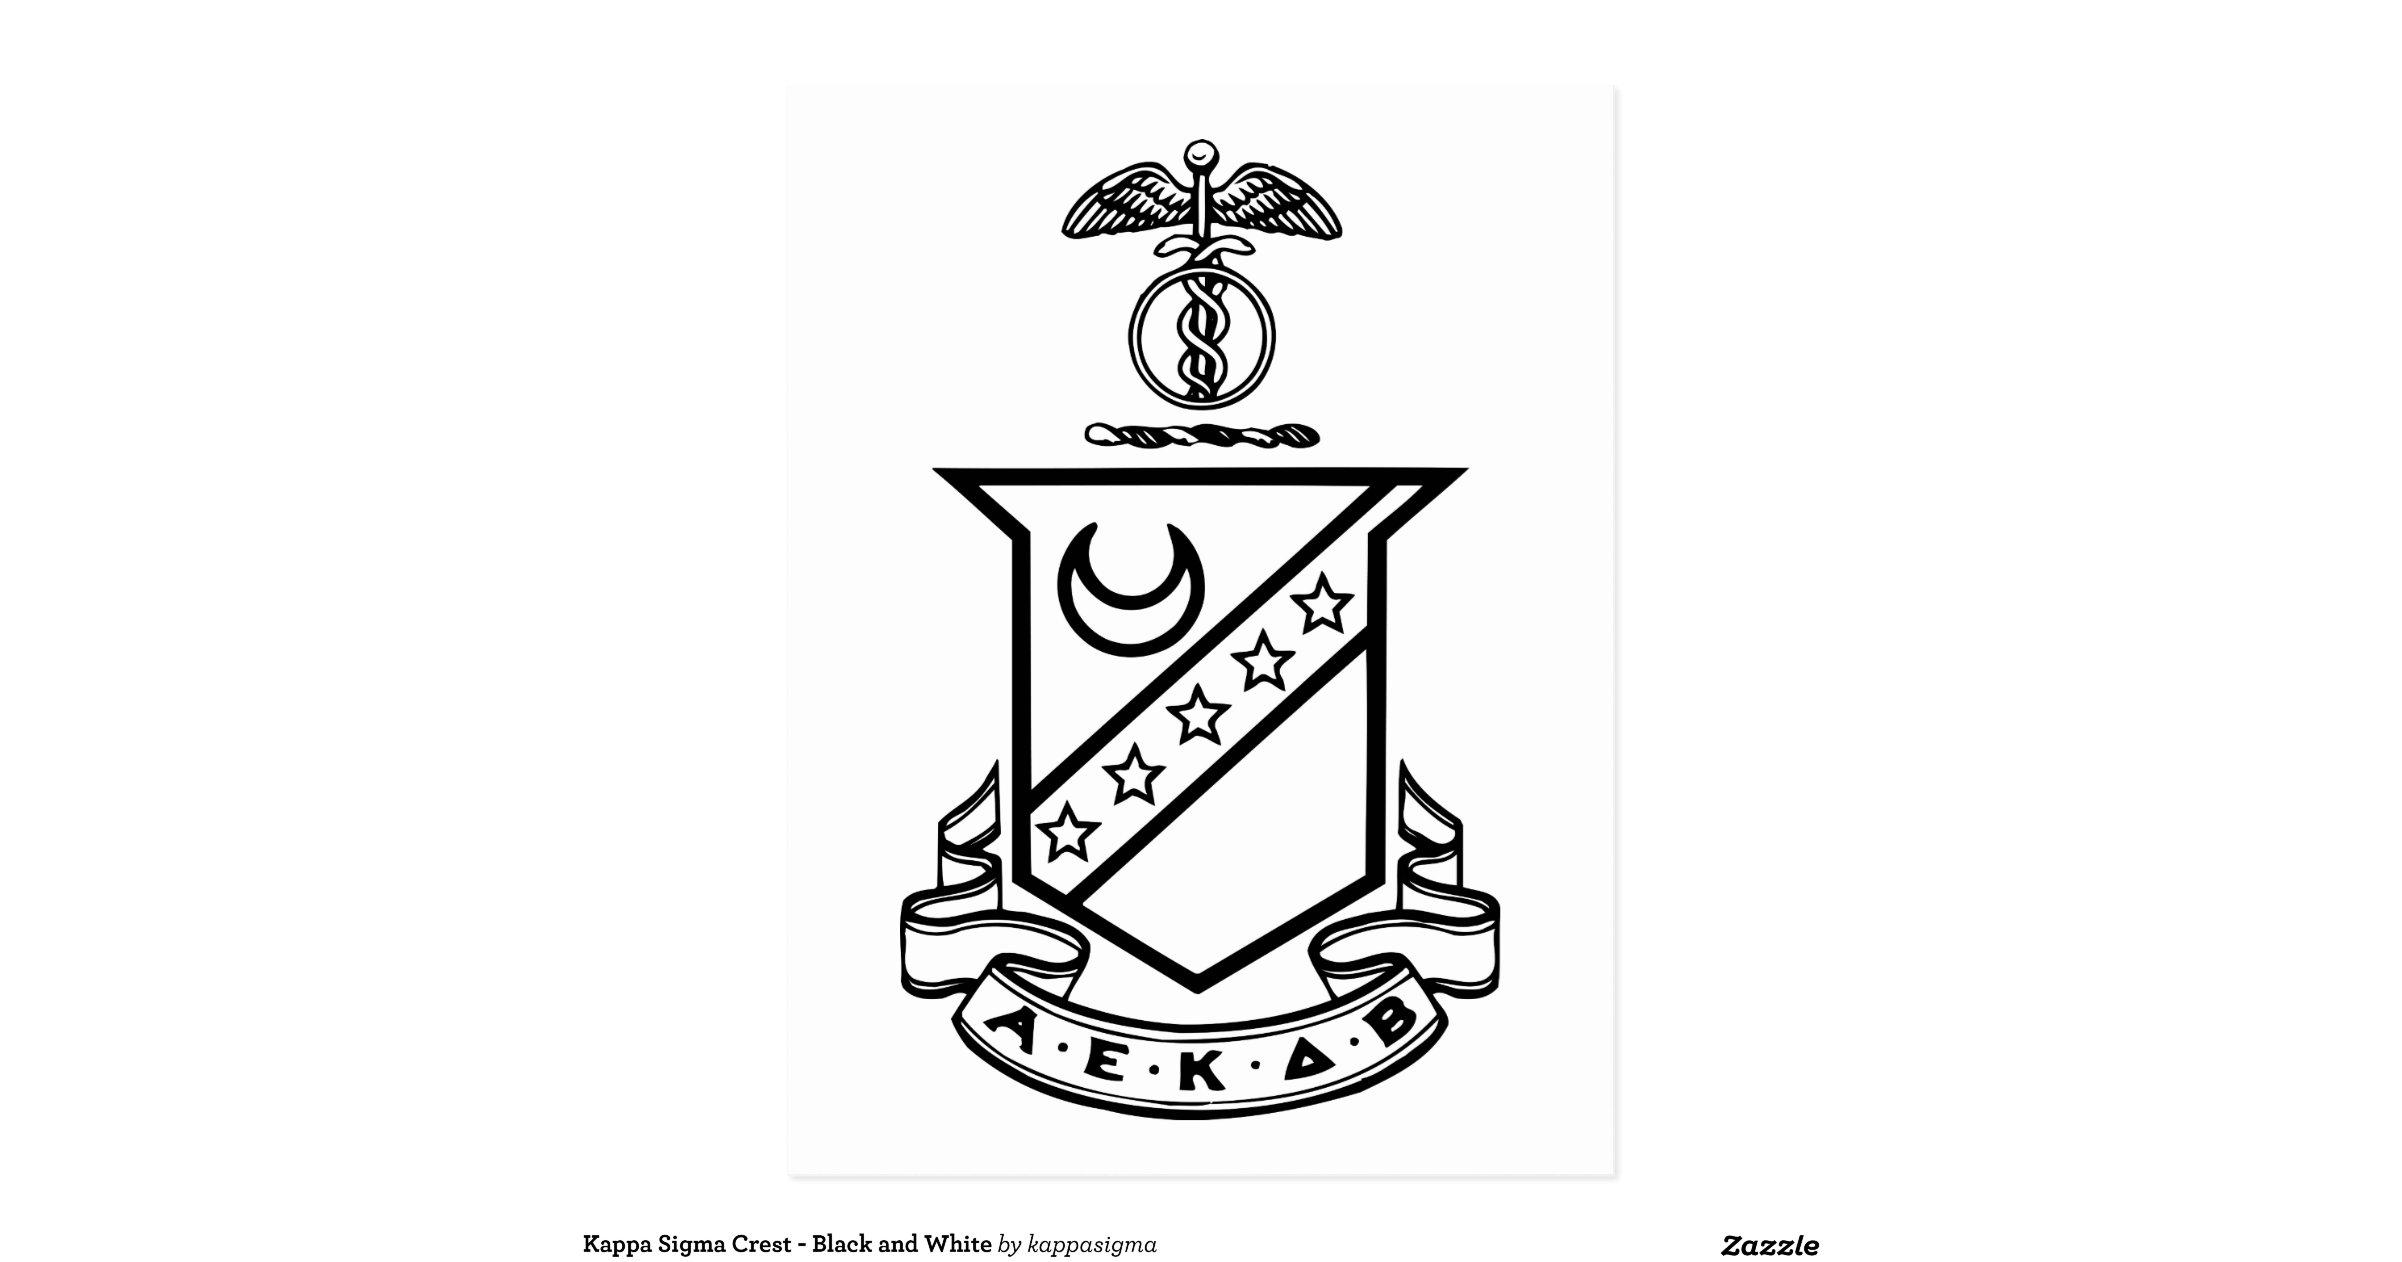 Pin Sigma Kappa And Alpha Chi Omega Kathryn Haug on Pinterest